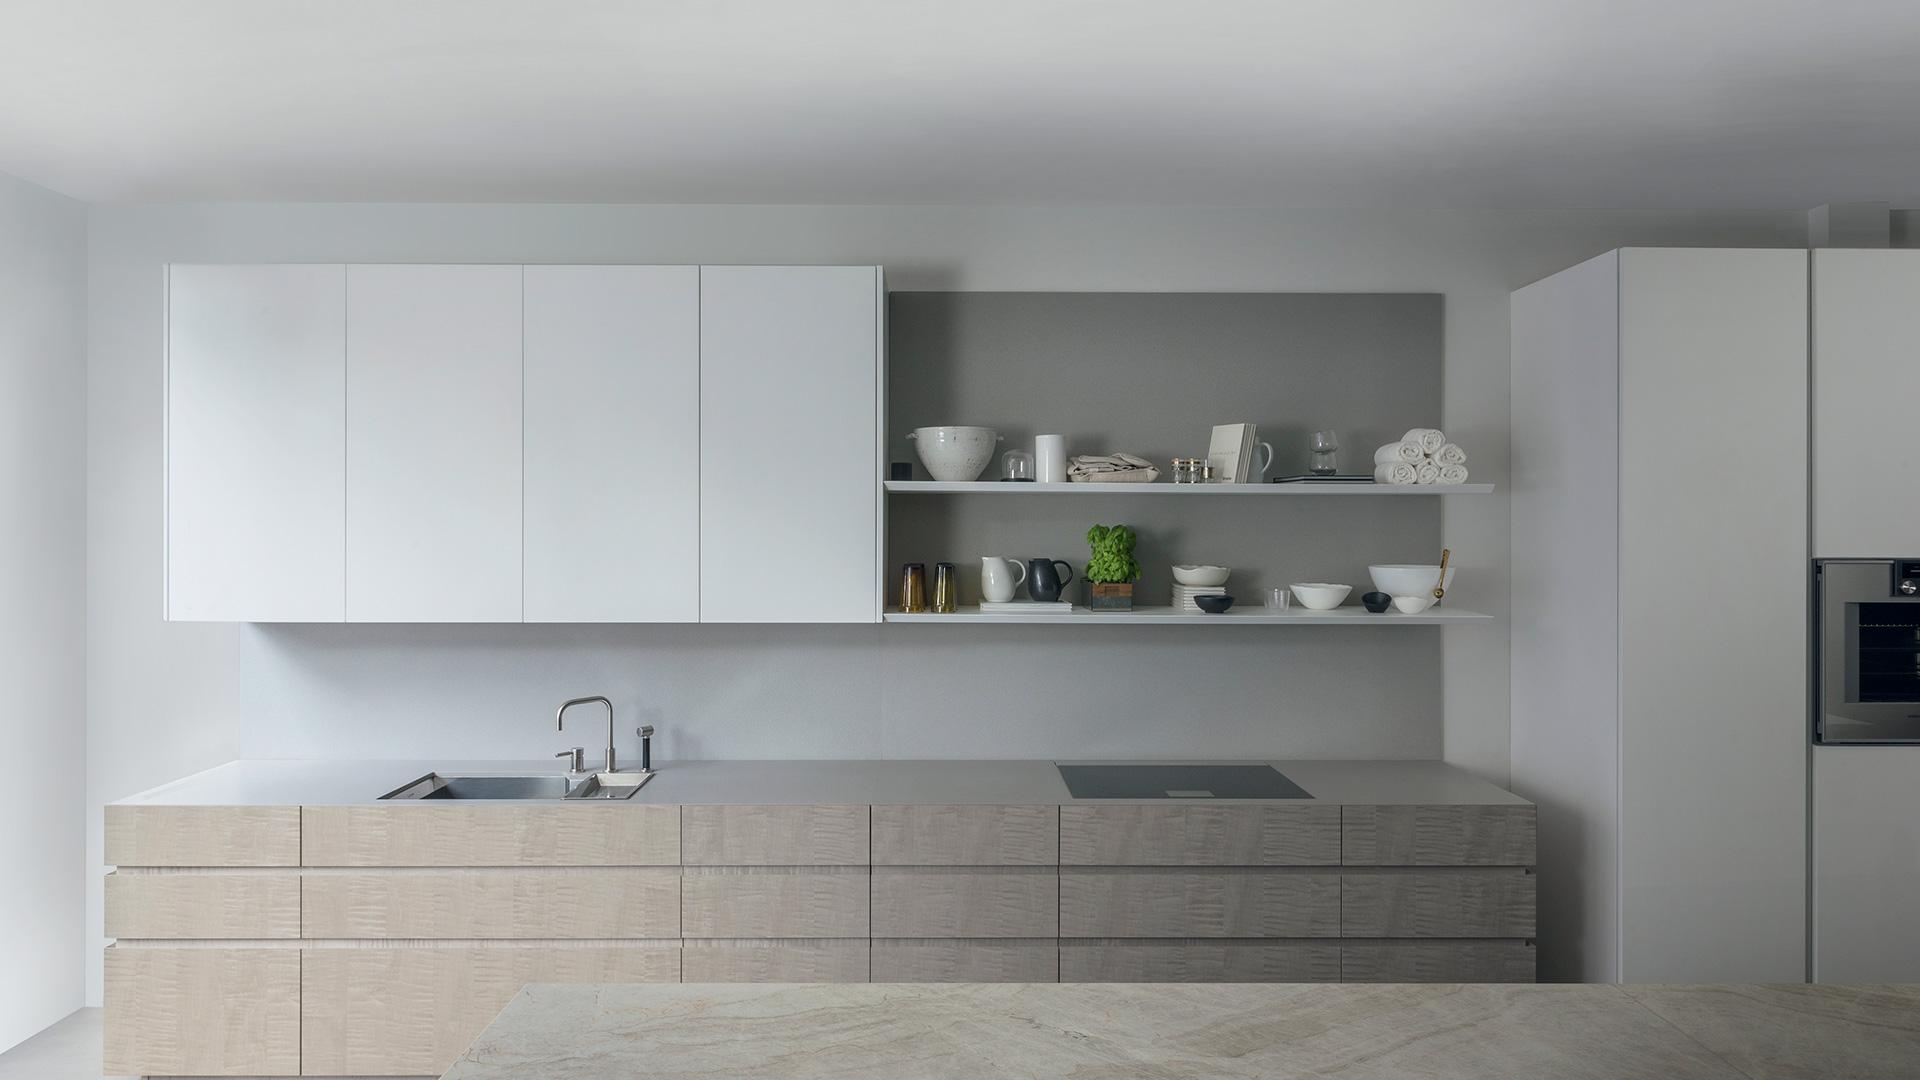 Linear Kitchen with sycamore and quartz - TM_LN17_LAUREN_T45-EVO_001